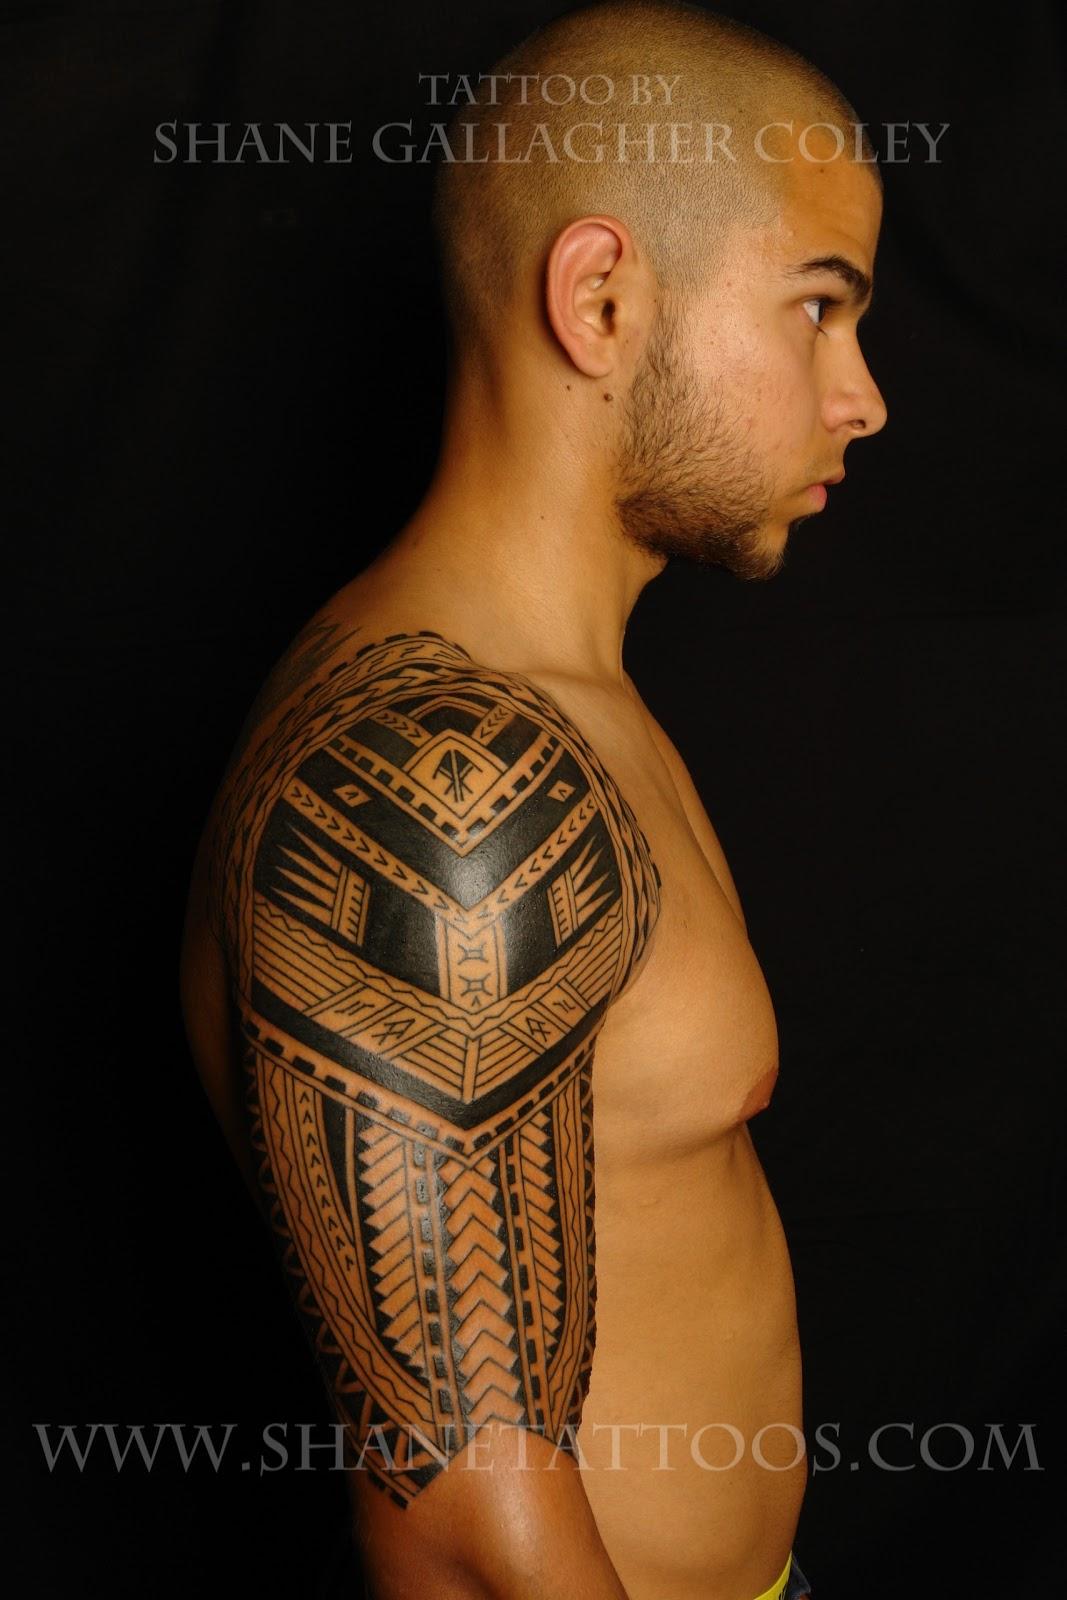 Polynesian/Samoan Sleeve Tattoo (in progress)